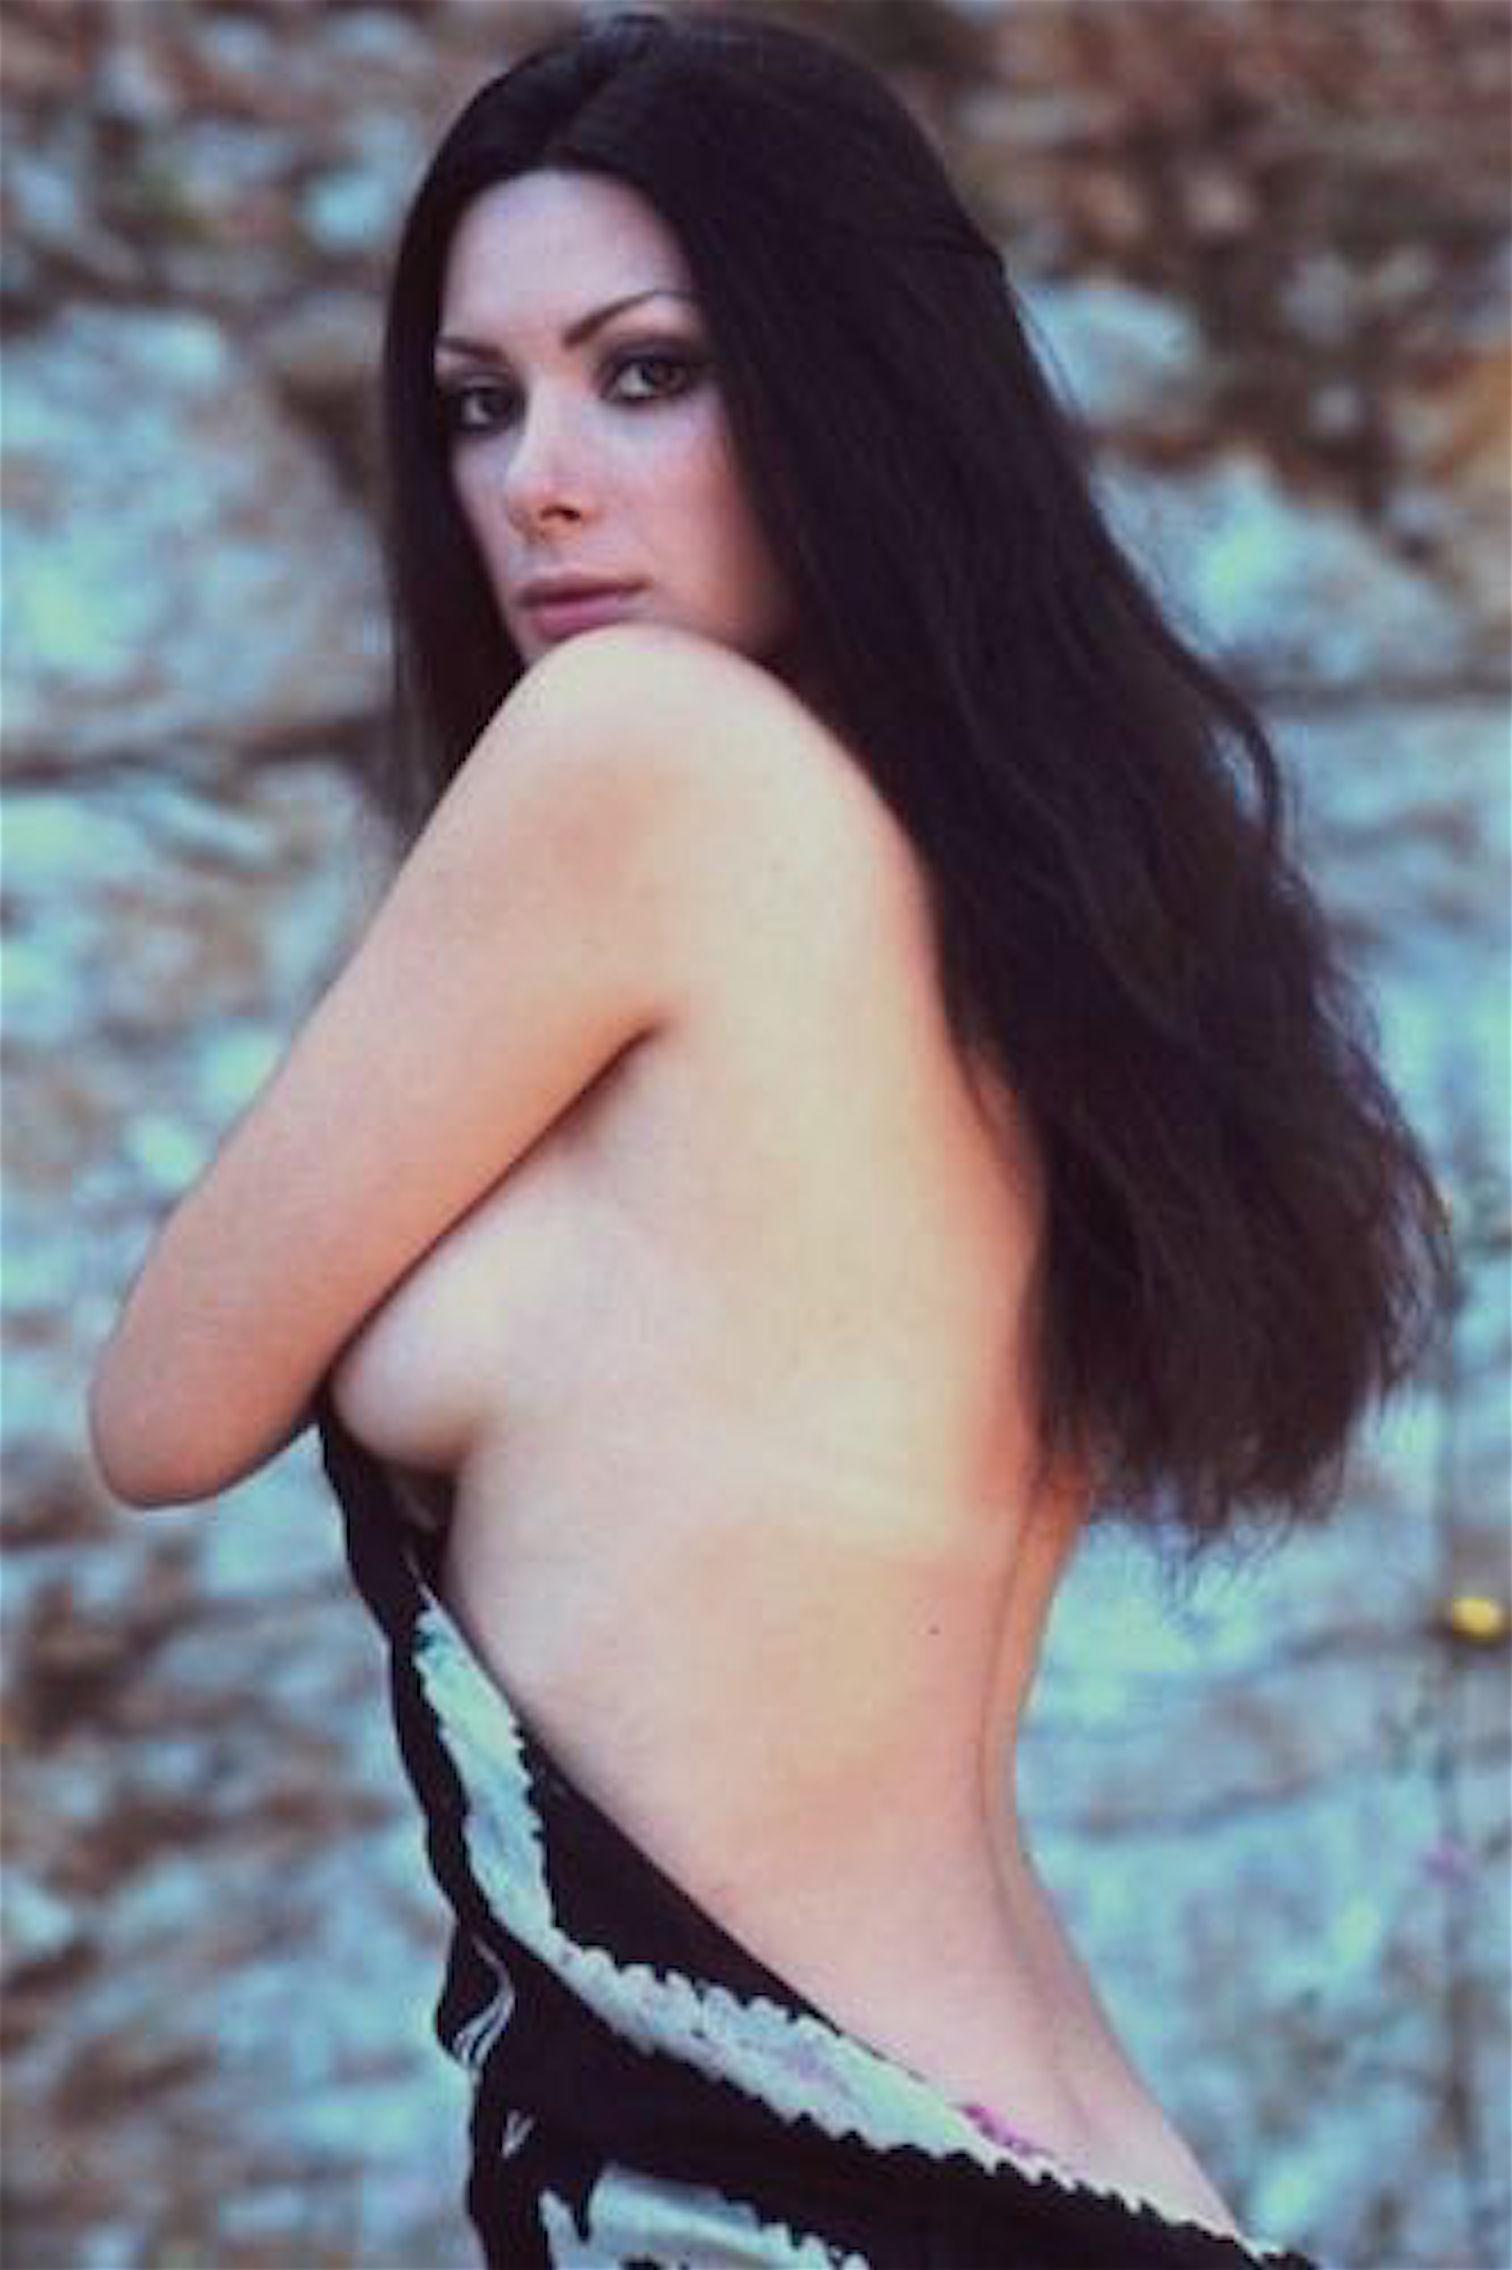 attrici film erotici italiani ragazze italiana